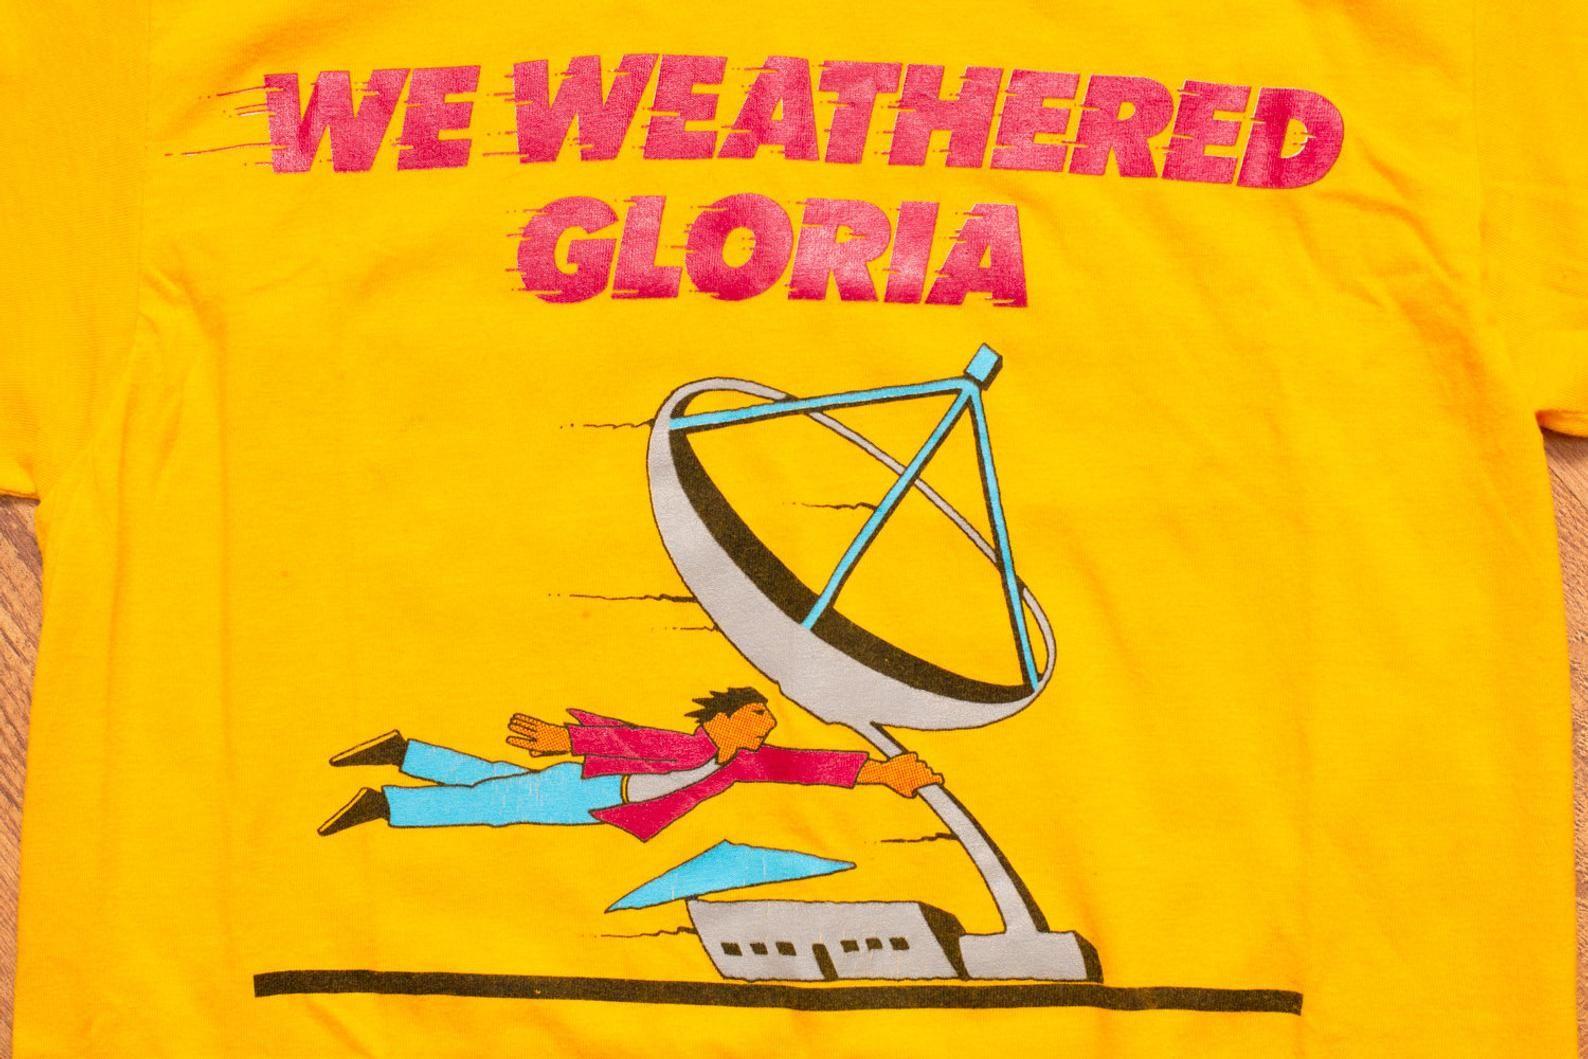 Rare 80s Mtv Hurricane Gloria T Shirt Xs Vintage 1980s Nickelodeon Vh 1 Network Operations Center We Weathered Satellite Graphic Tee Graphic Tees Vintage Mtv